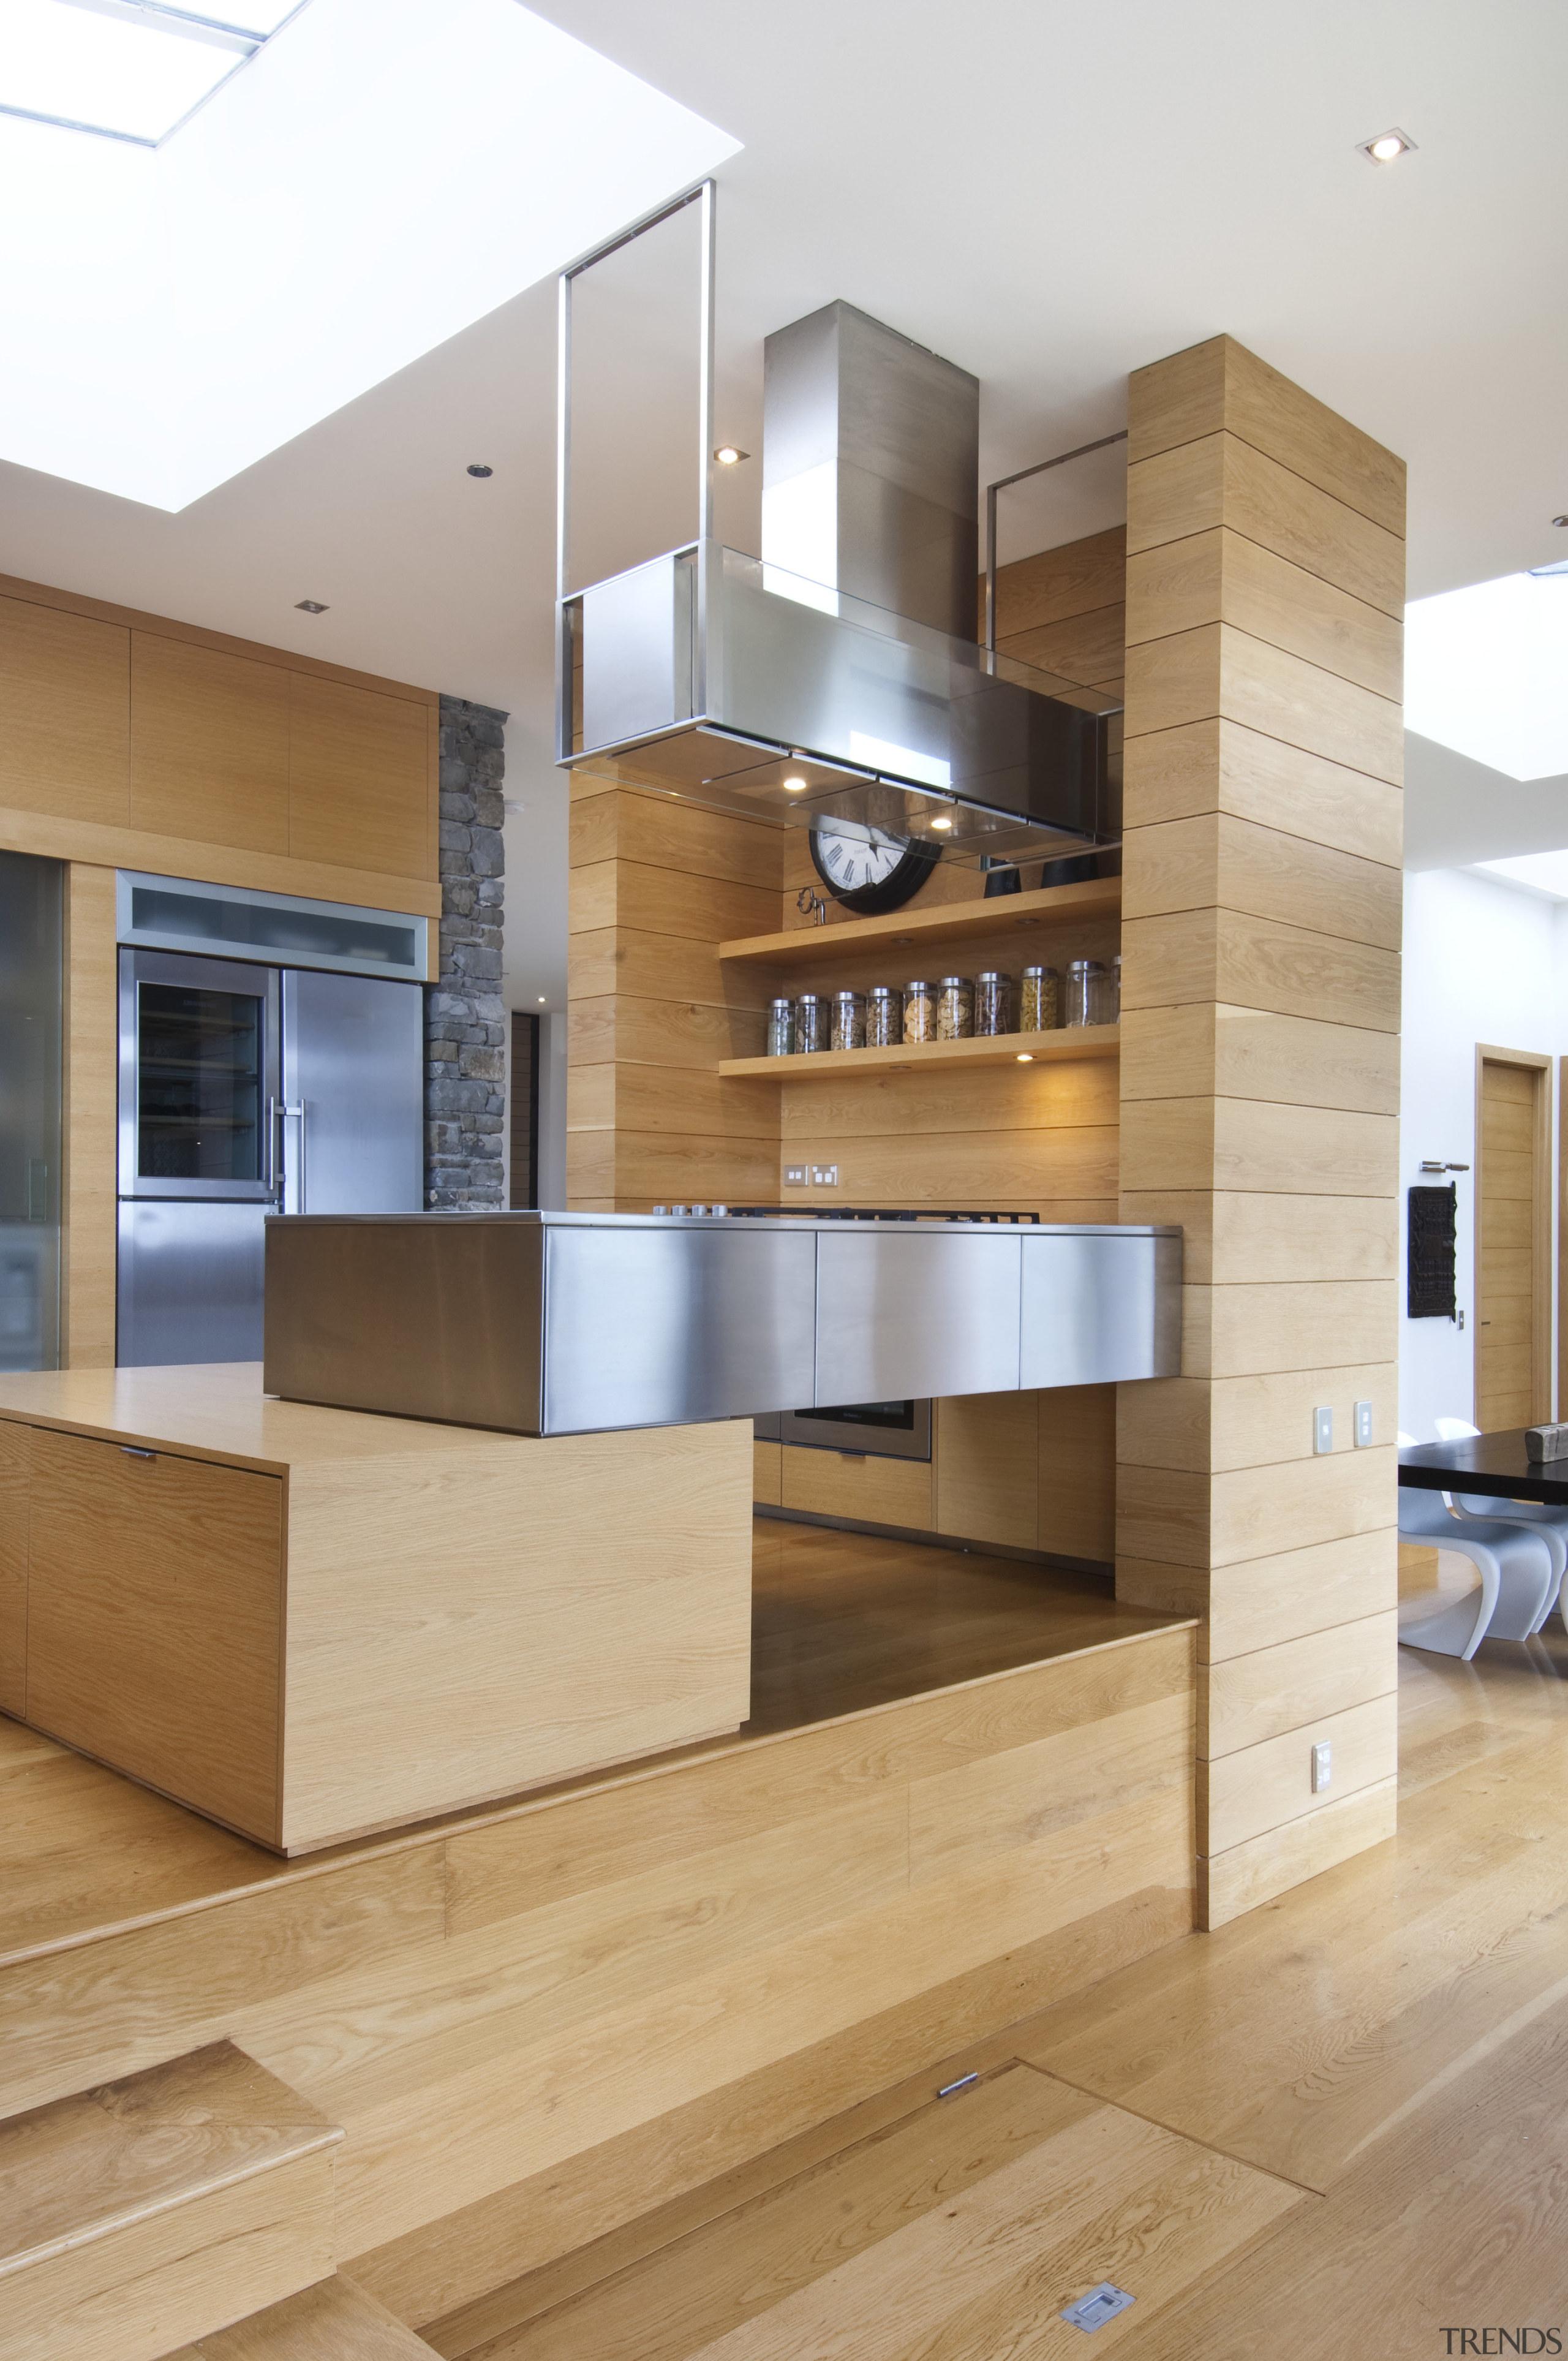 Raised floor kitchen. Stainless steel Binova cooktop. American cabinetry, floor, flooring, furniture, hardwood, interior design, kitchen, wood, wood flooring, orange